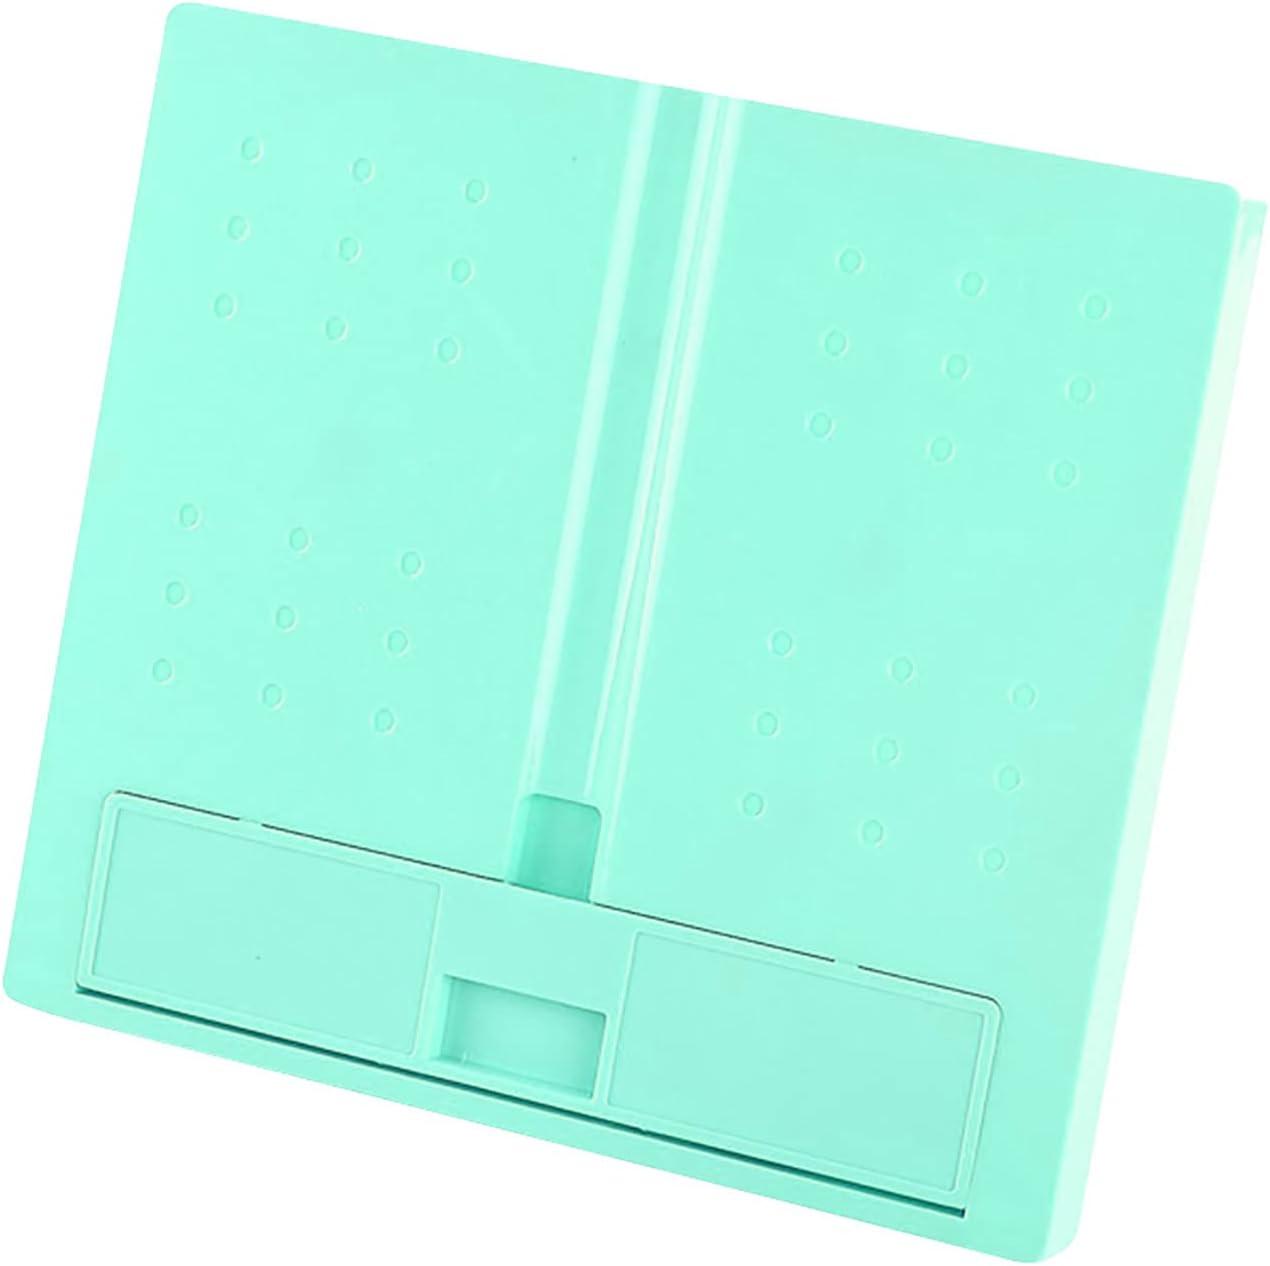 Portable Plastic Book Stand Foldable Book Document Holder Adjust